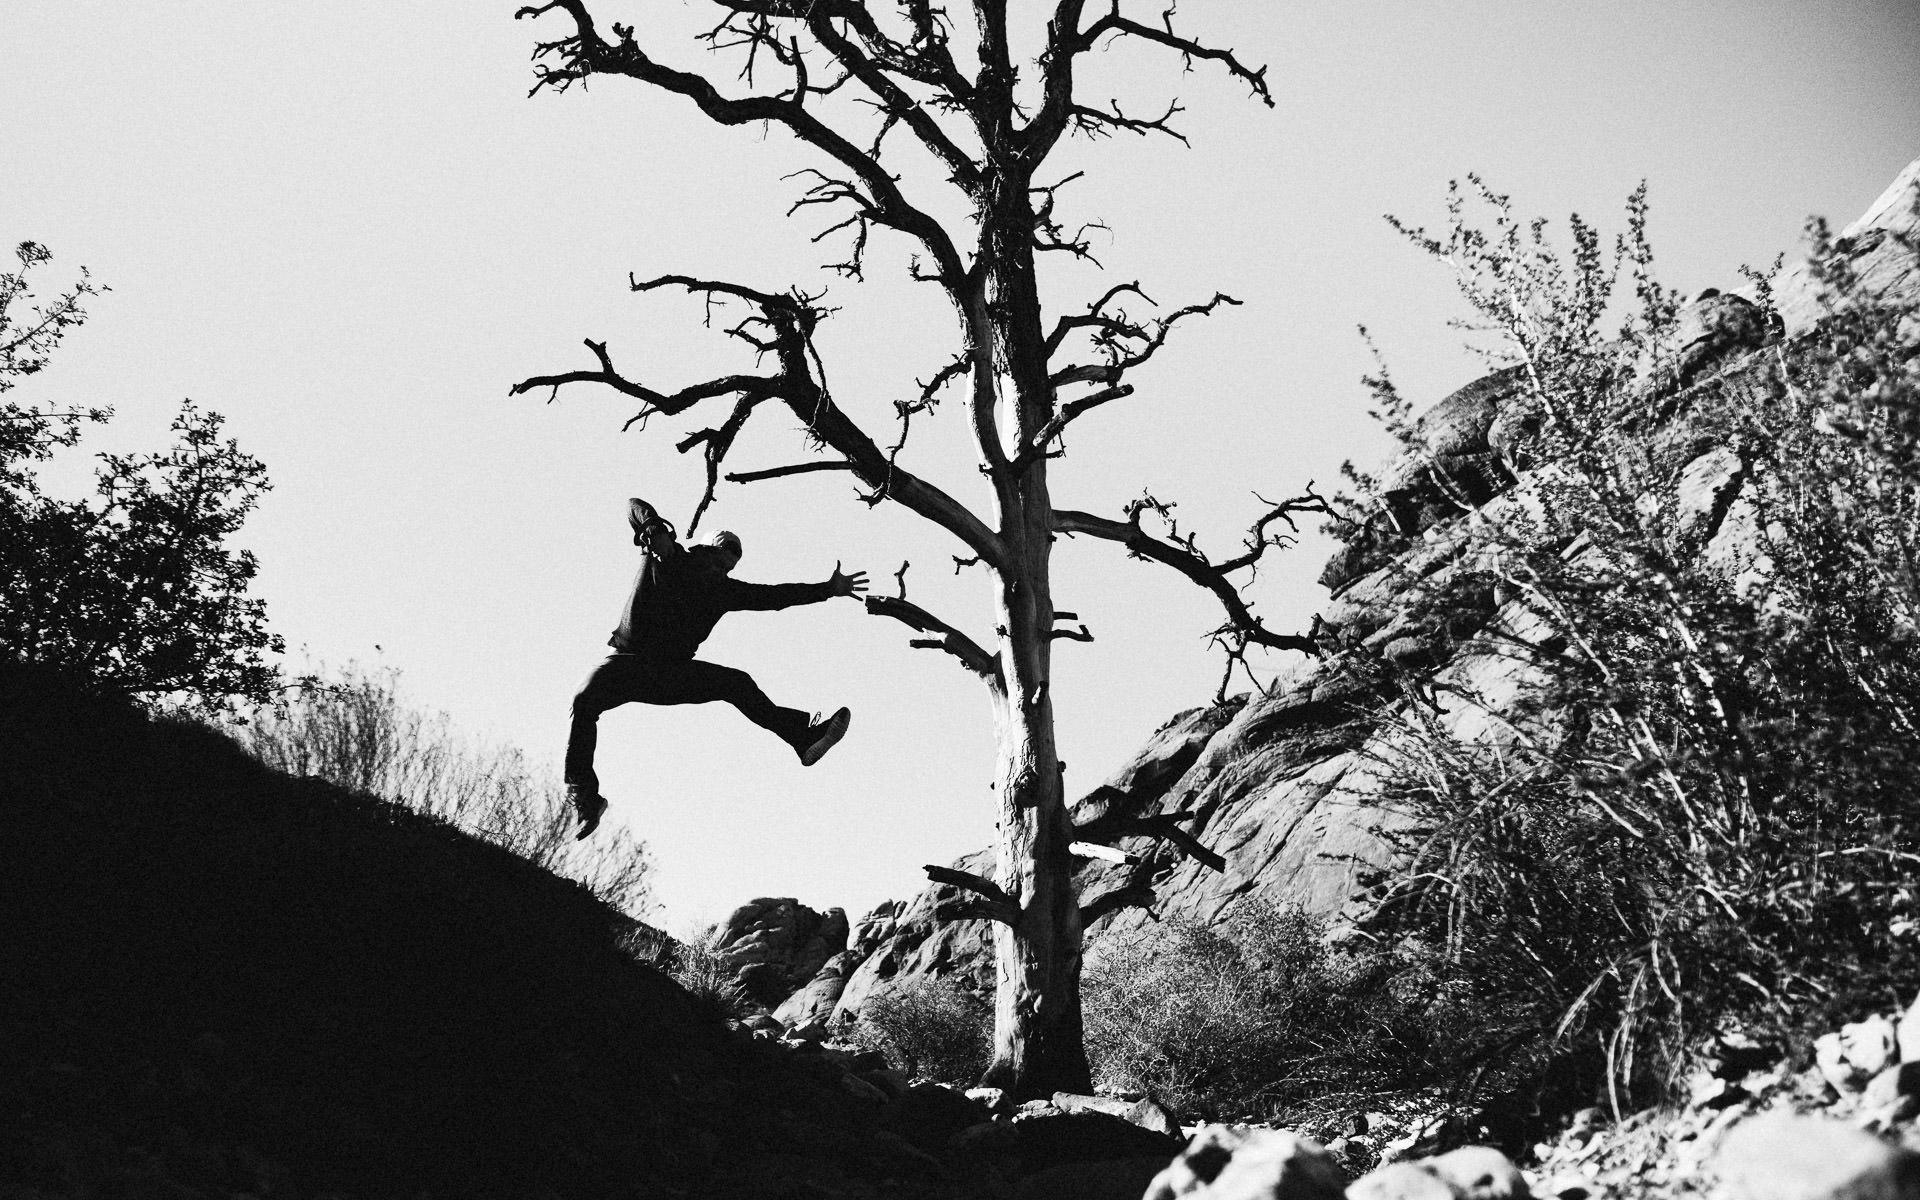 Twisted-Oaks-Studio-wppi-leica-red-rock-canyon-7.jpg